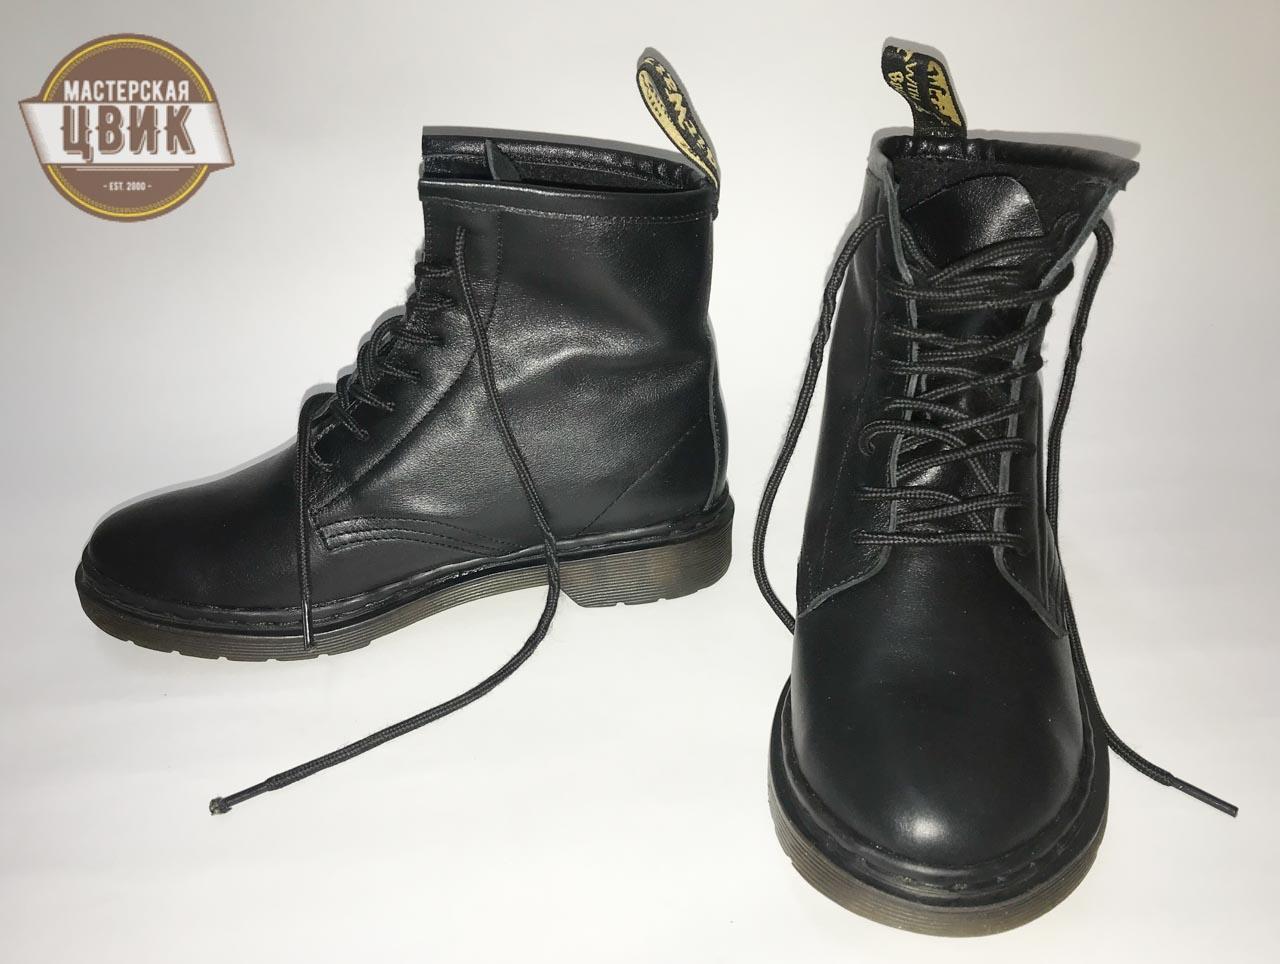 individualnyj-poshiv-obuvi-minsk-60 Индивидуальный пошив обуви